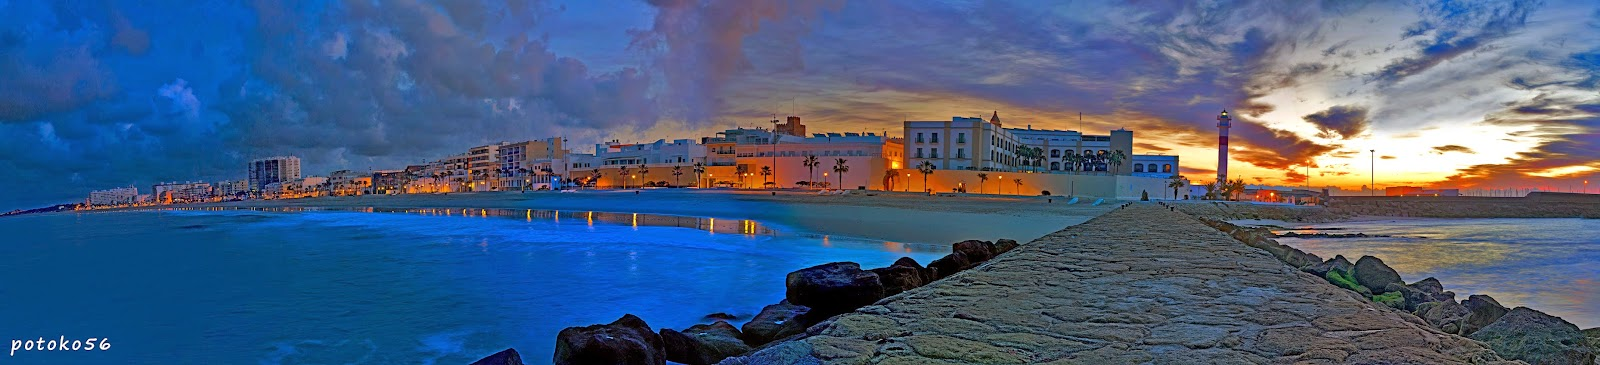 Panoramica de Rota desde Hotel Playa hasta el Muelle